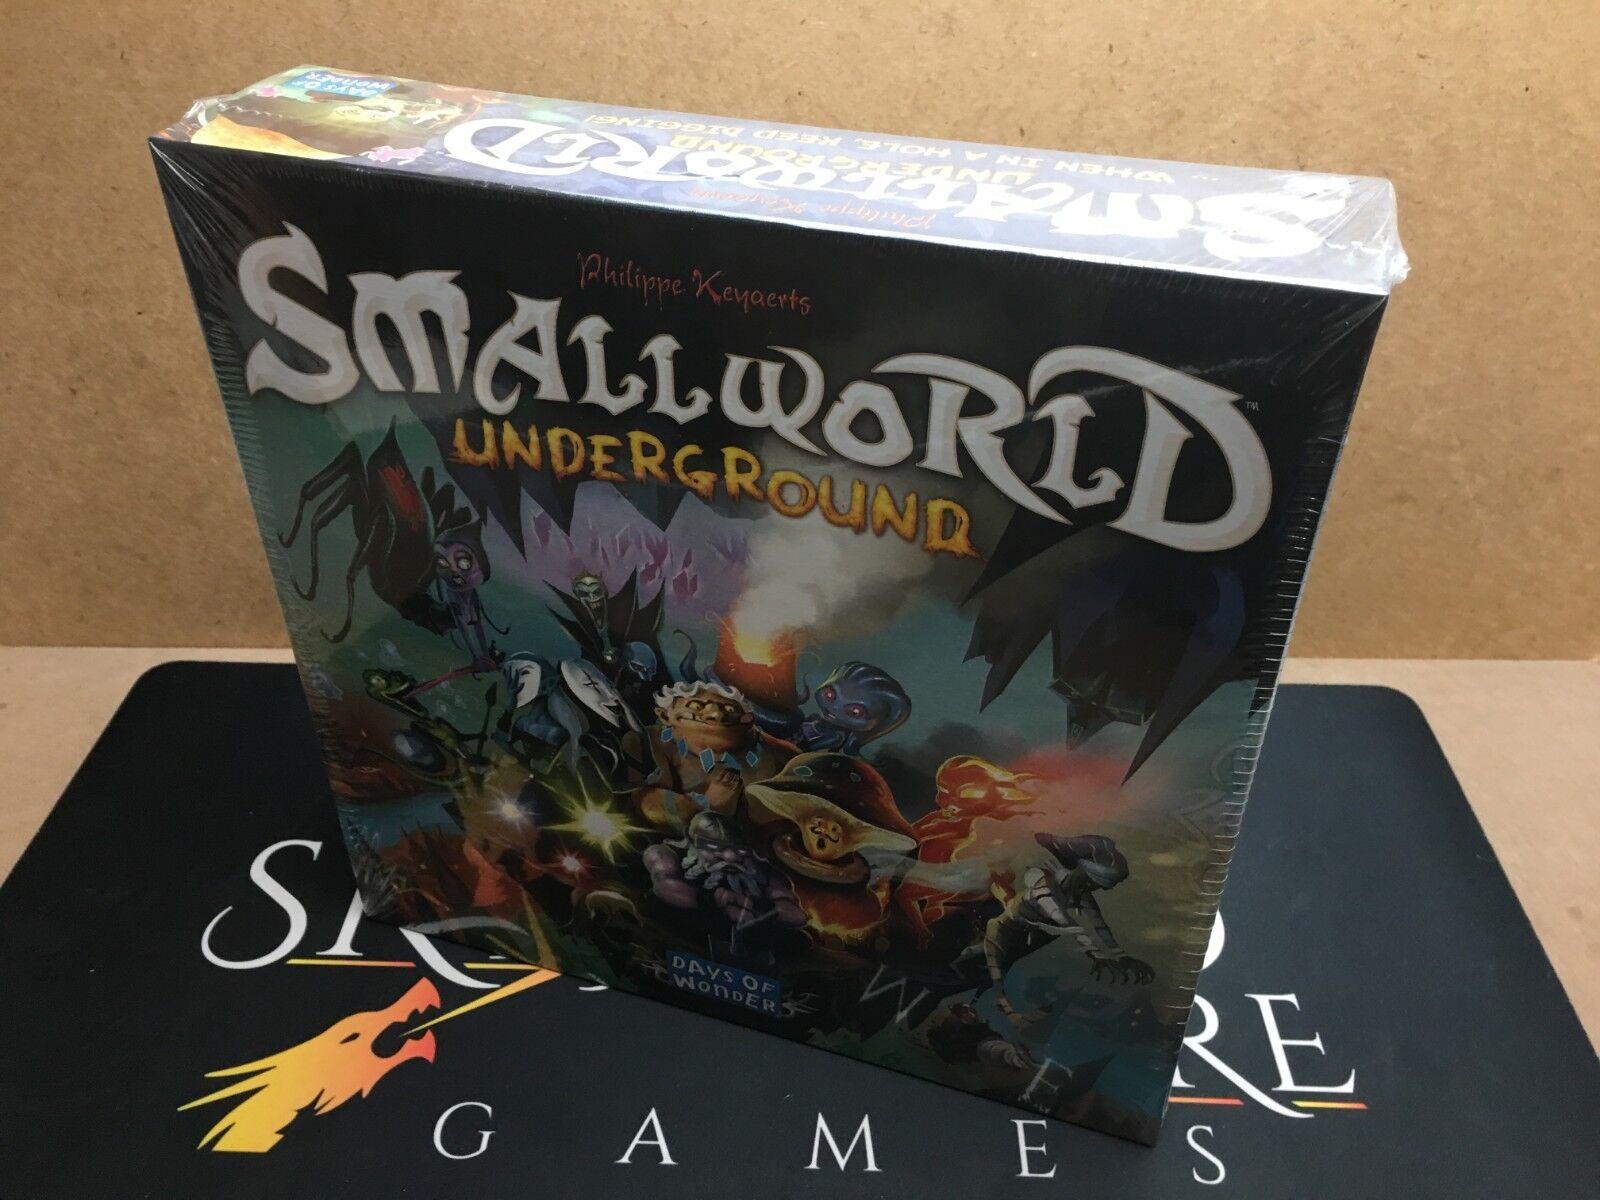 Small World Underground the Board Game - Days of Wonder (Genuine Sealed)